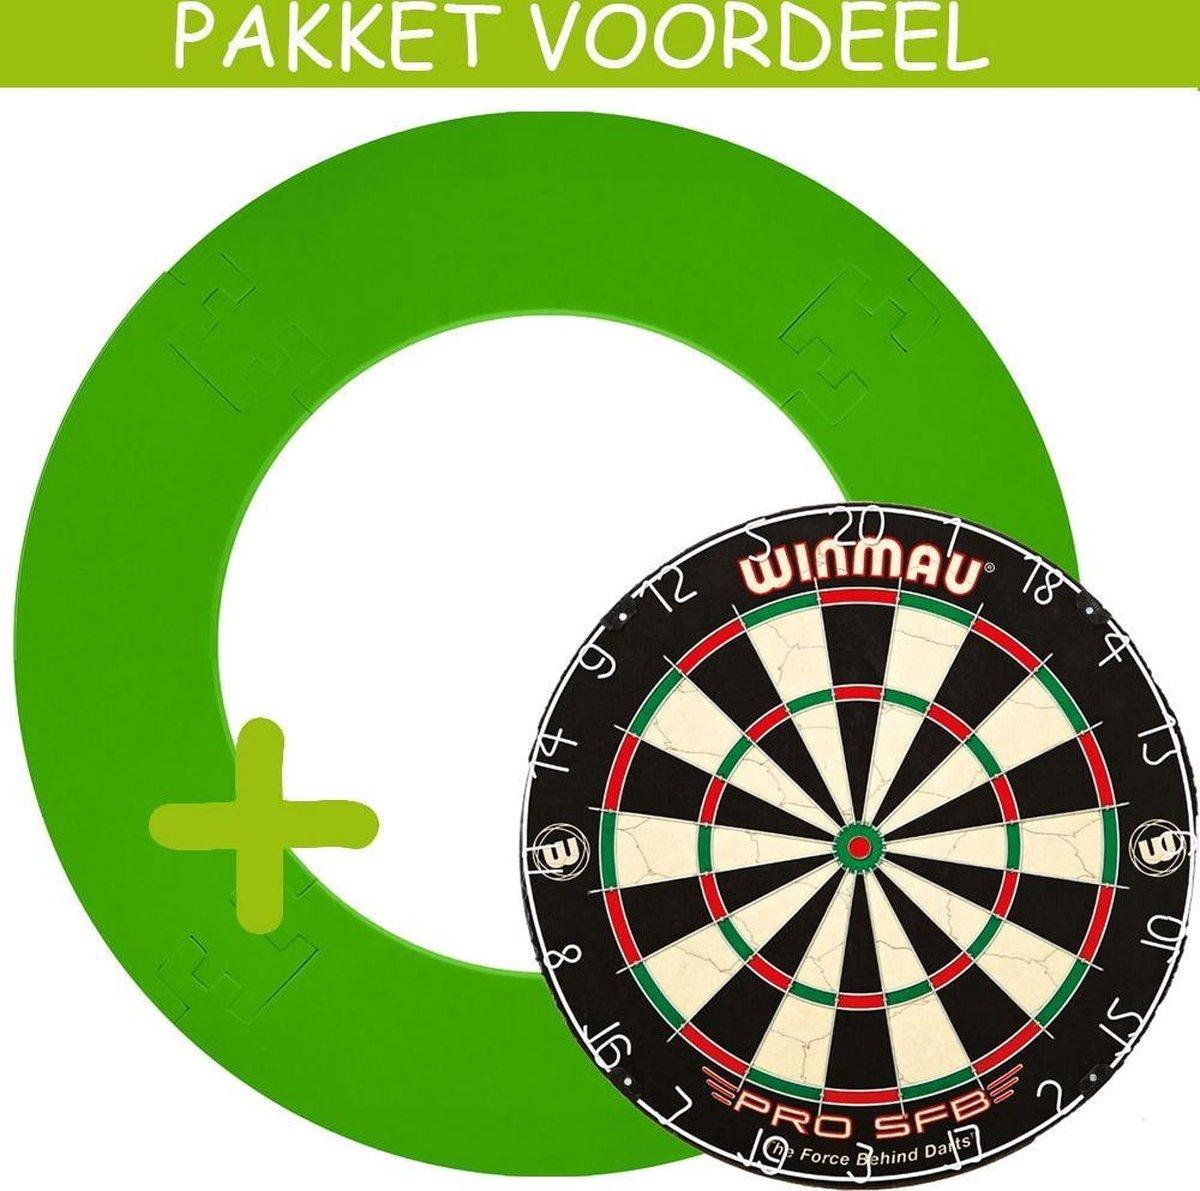 Dartbord Surround VoordeelPakket - Pro SFB - EVA Surround-- (Groen)